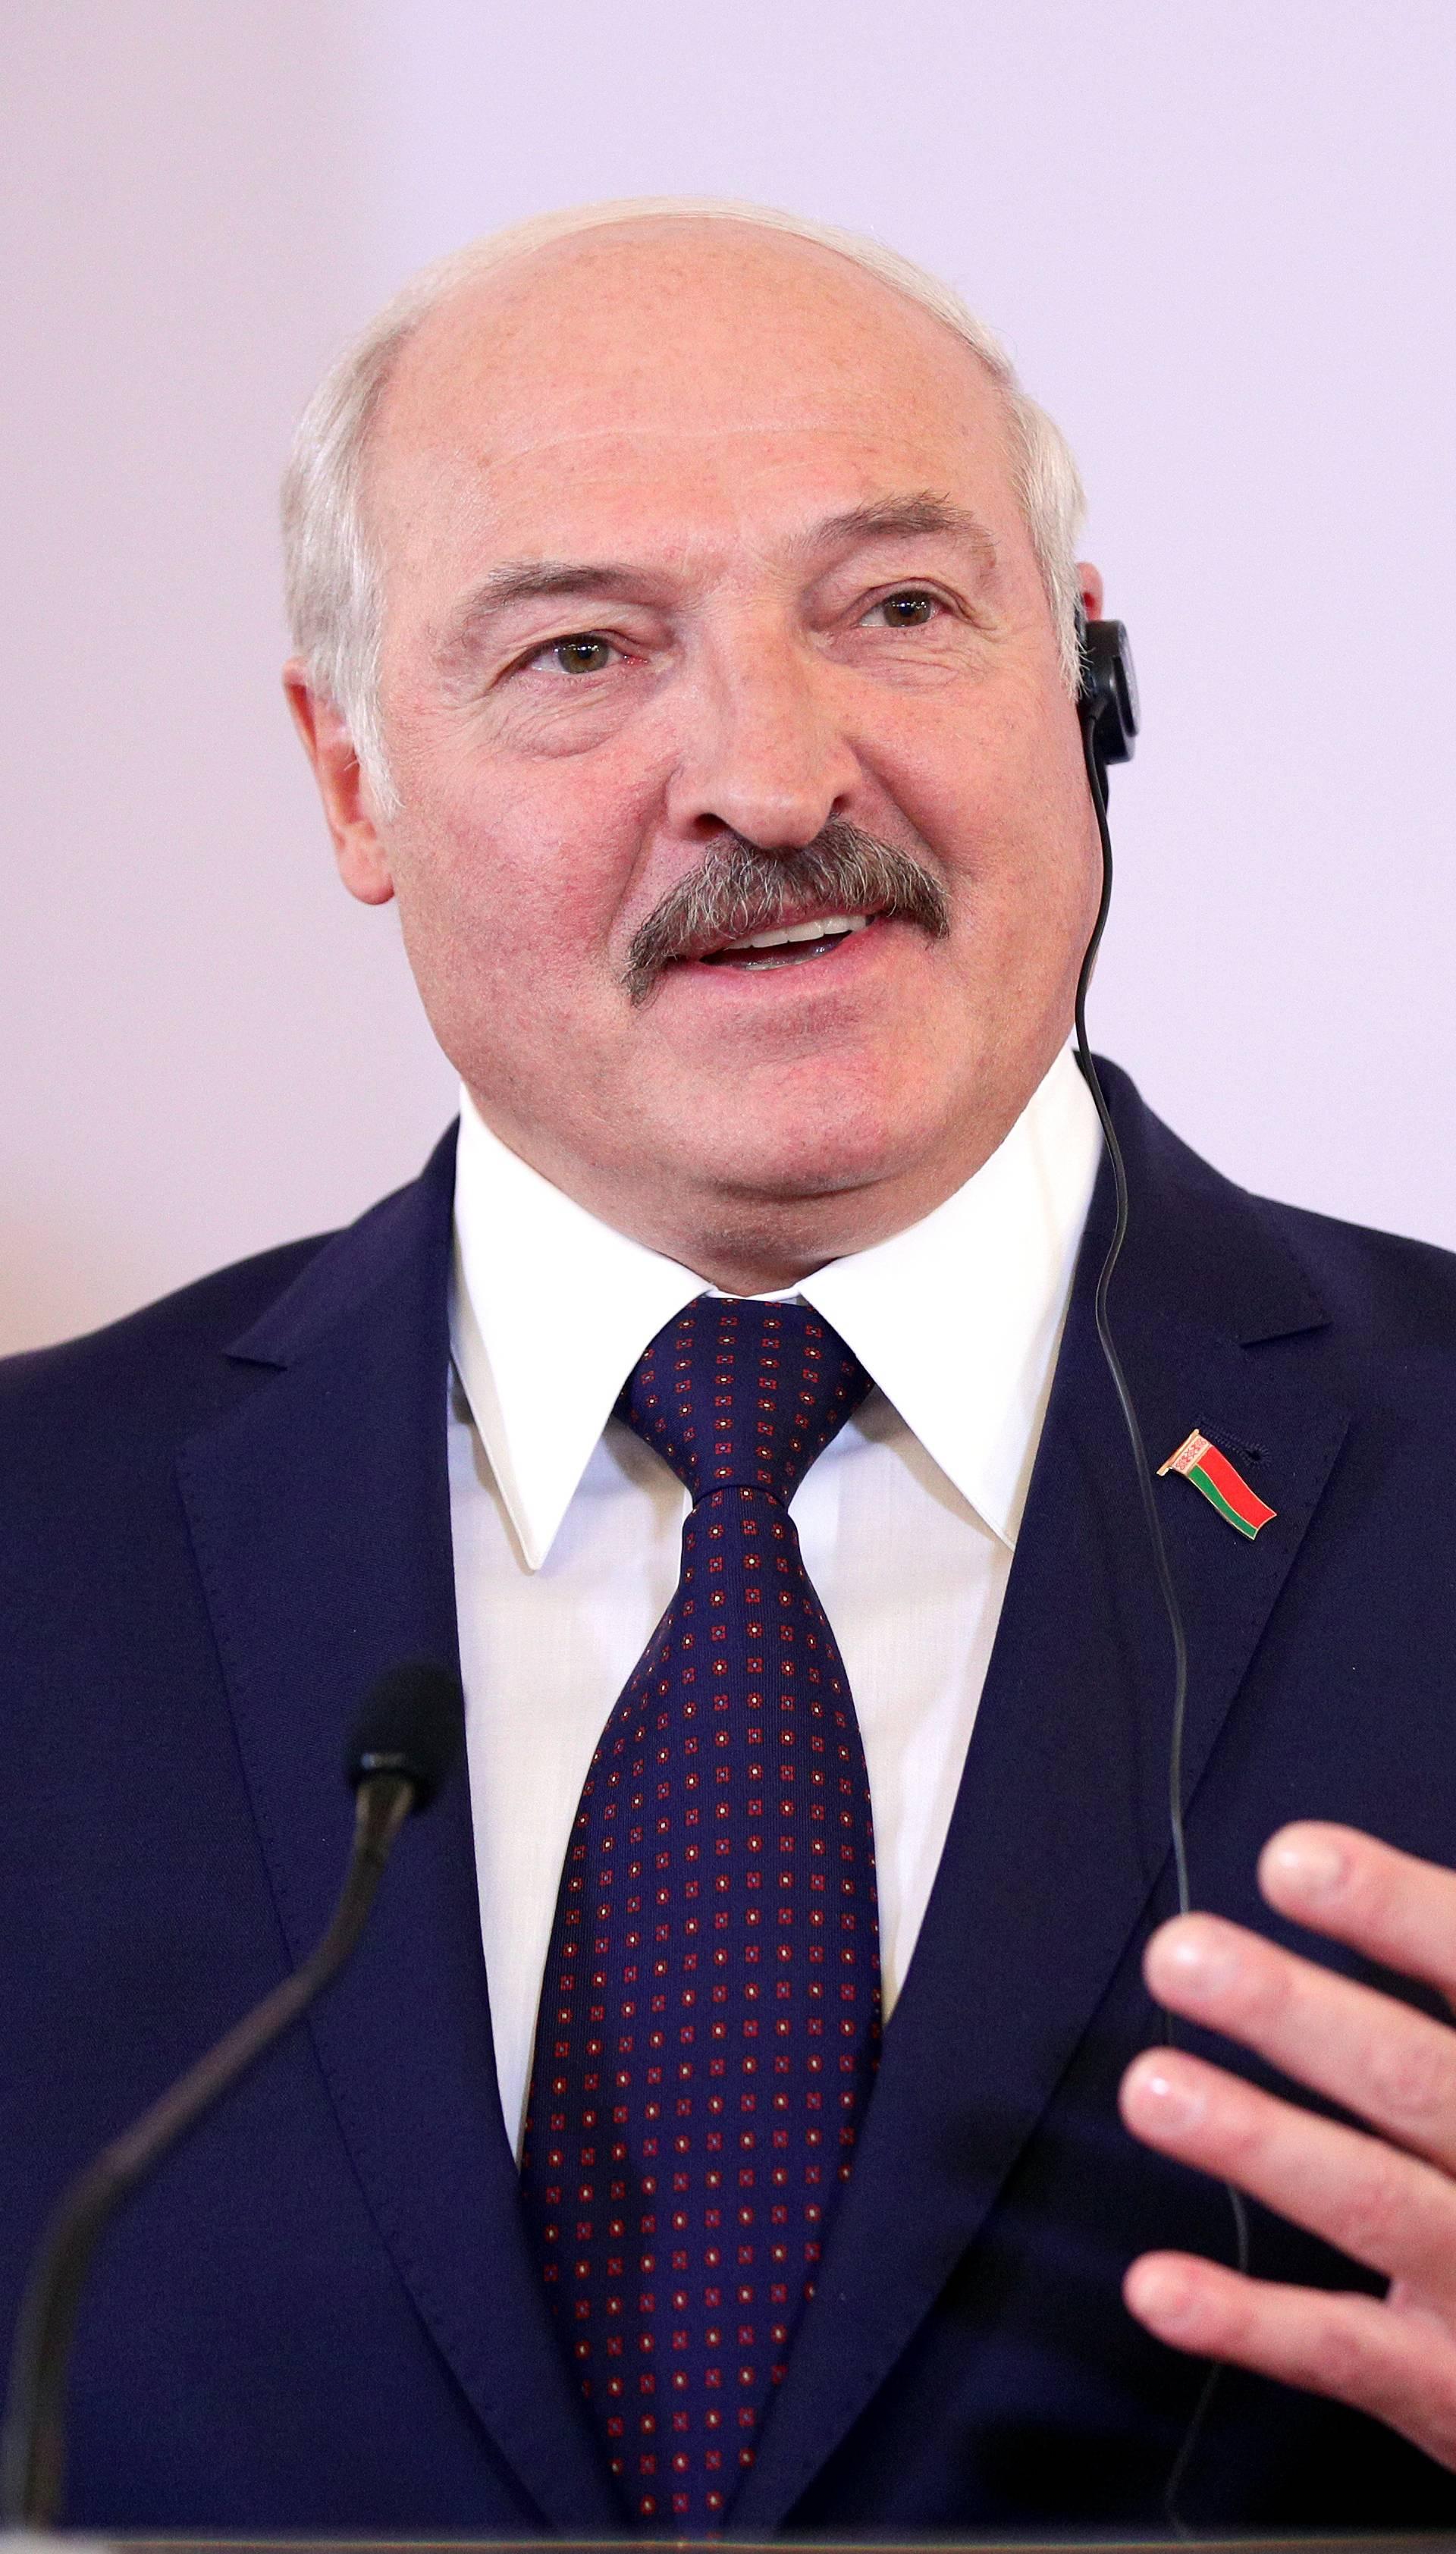 Belarusian President Alexander Lukashenko attends a news conference in Vienna